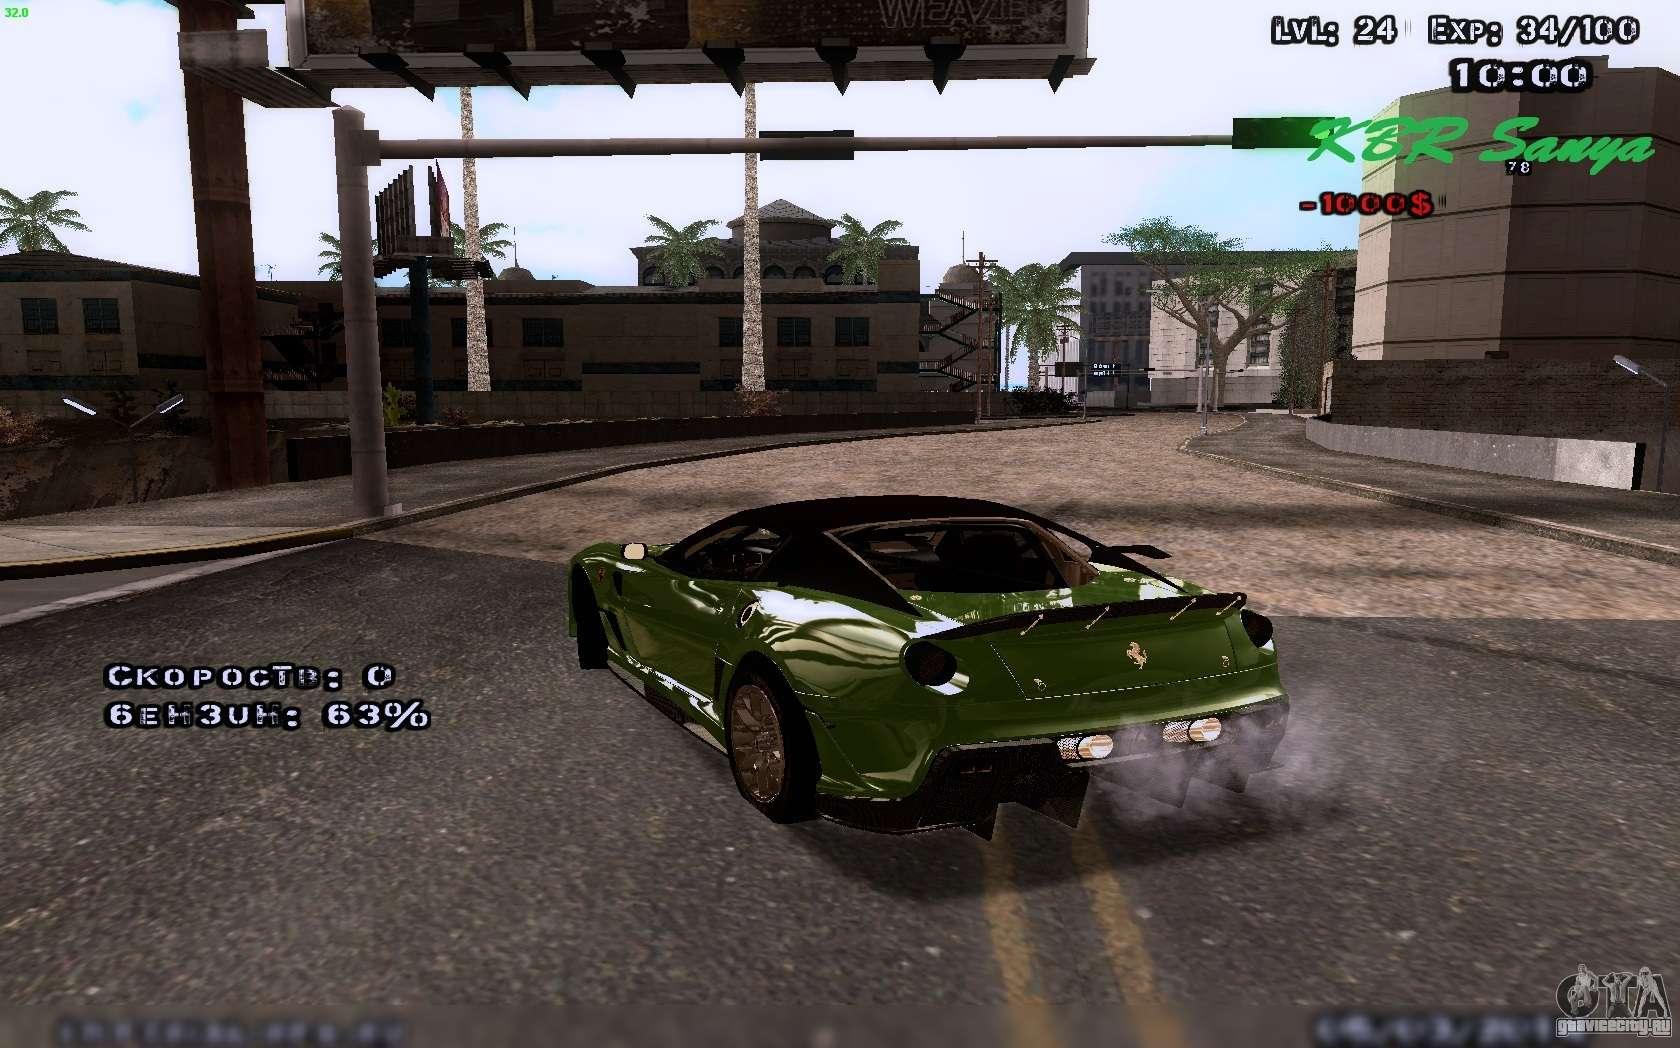 Gta san andreas mods gta v hud by dk22pac gameplay [download.